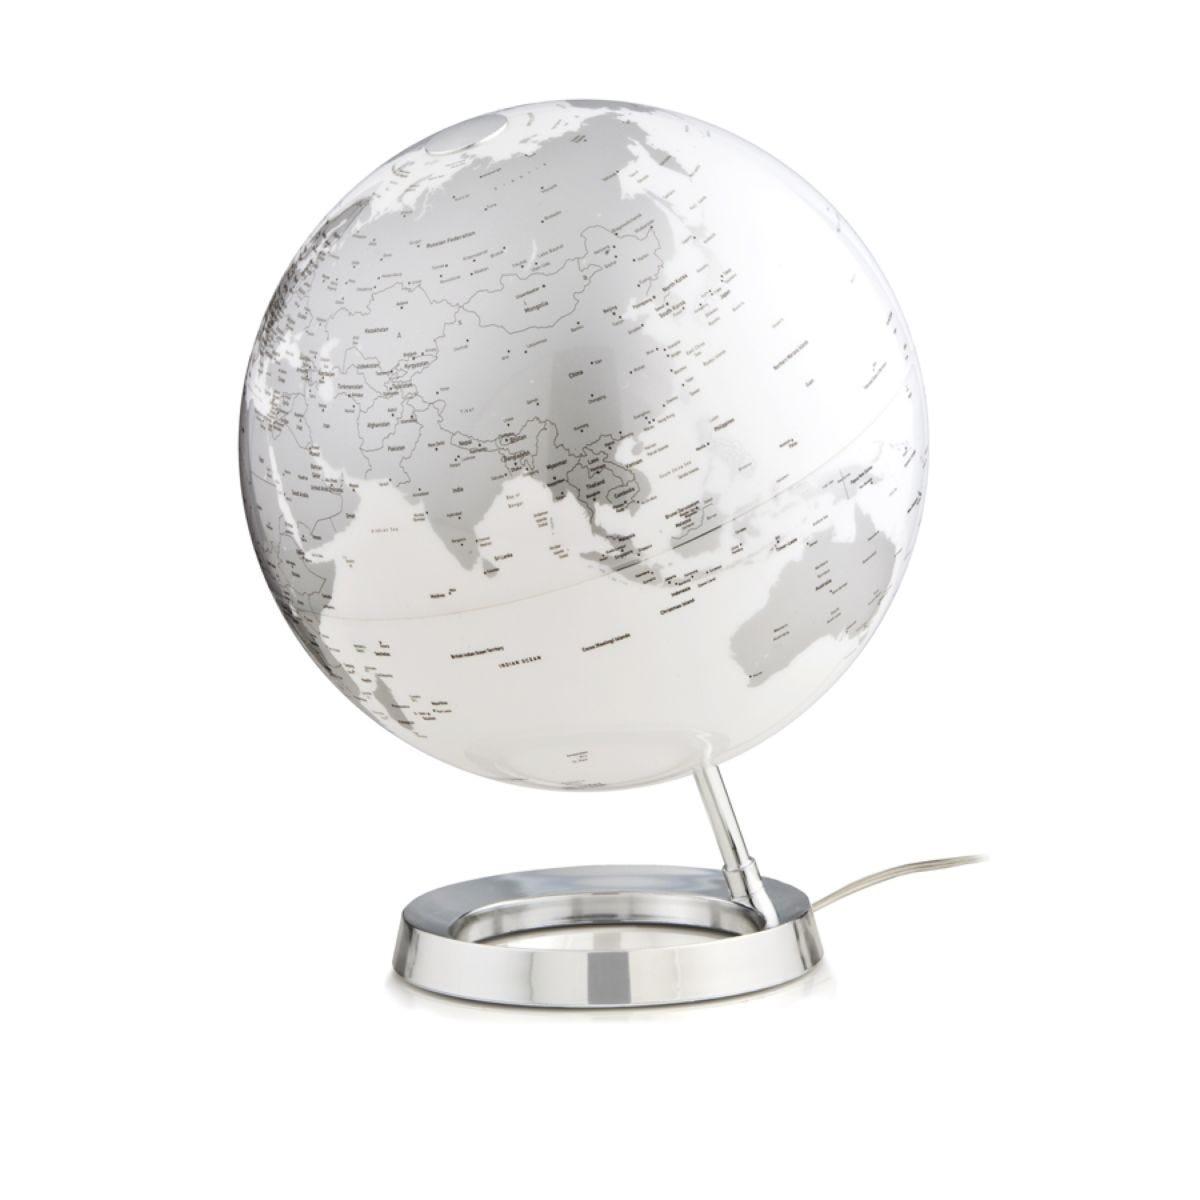 Atmosphere 30cm Illuminated Globe - Bright Chrome